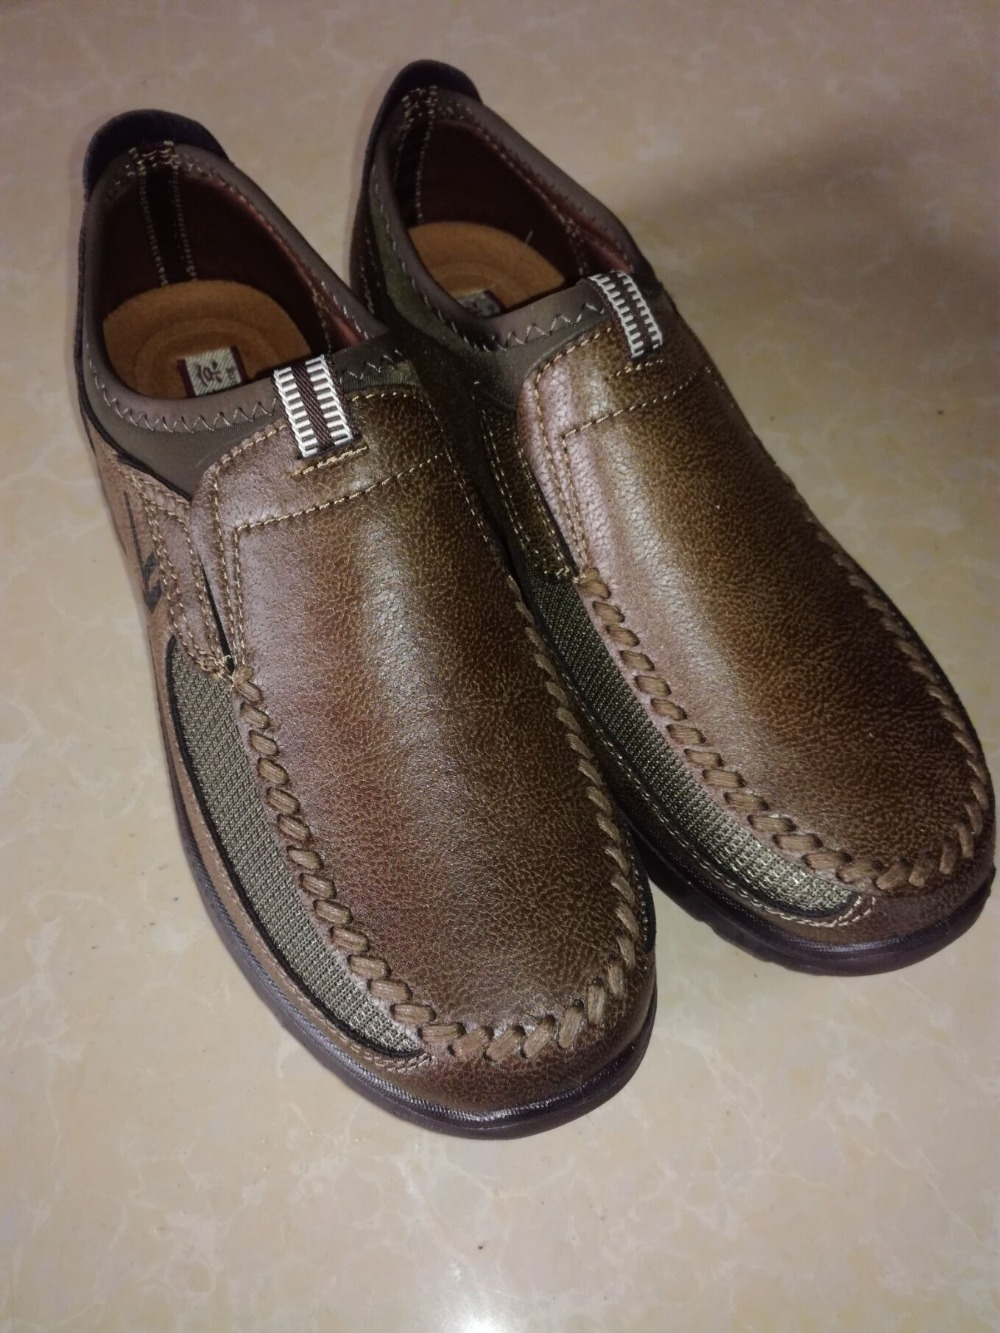 HTB1YuVkPYvpK1RjSZPiq6zmwXXaB Luxury Brand Men Casual Shoes Lightweight Breathable Sneakers Male Walking Shoes Fashion Mesh Zapatillas Footwear Big Szie 38-48